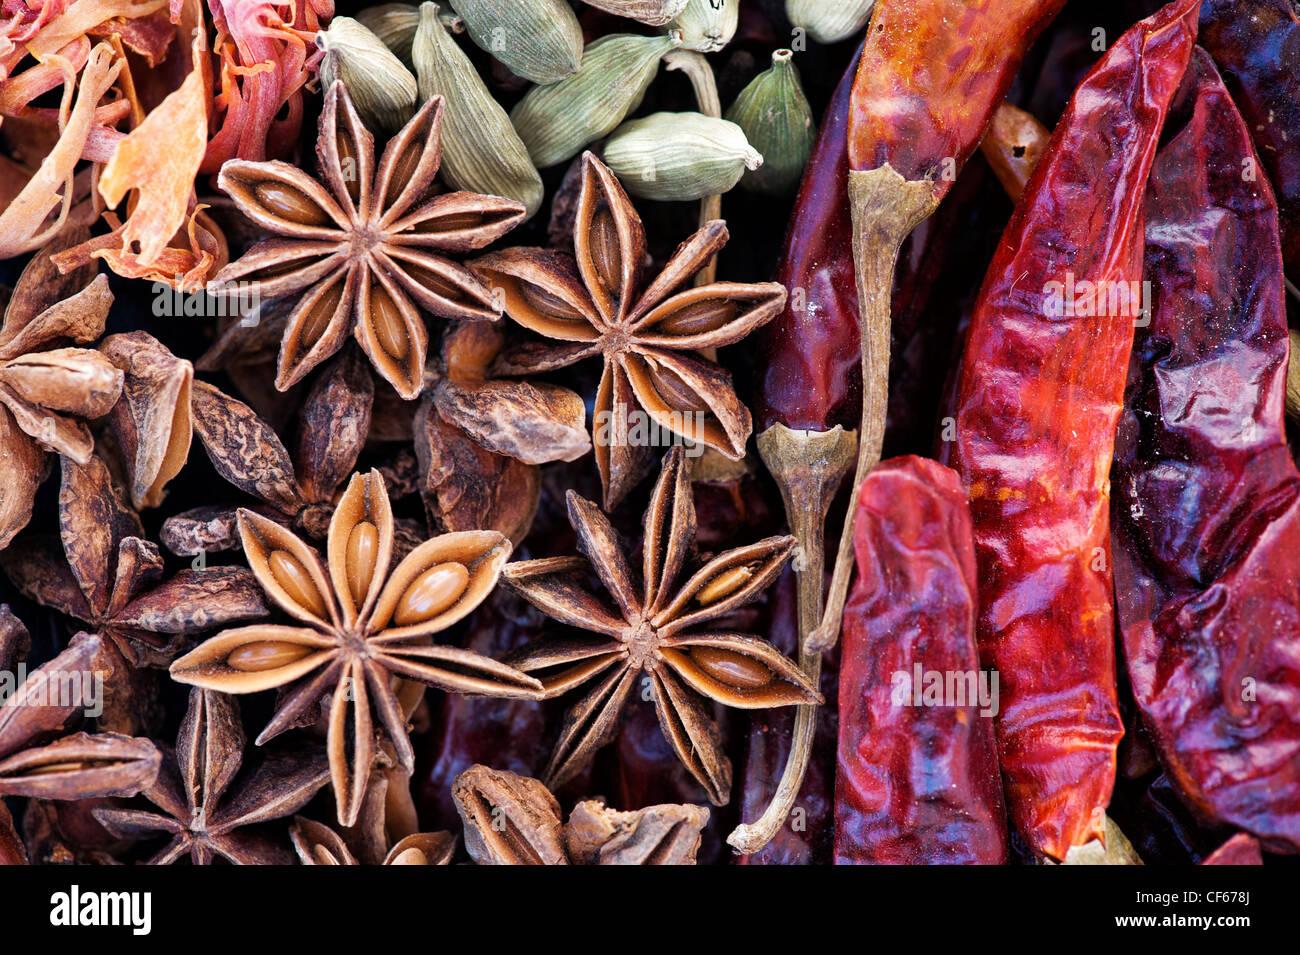 Cucina indiana spezie pattern. Piatto fotografia laici da sopra Immagini Stock